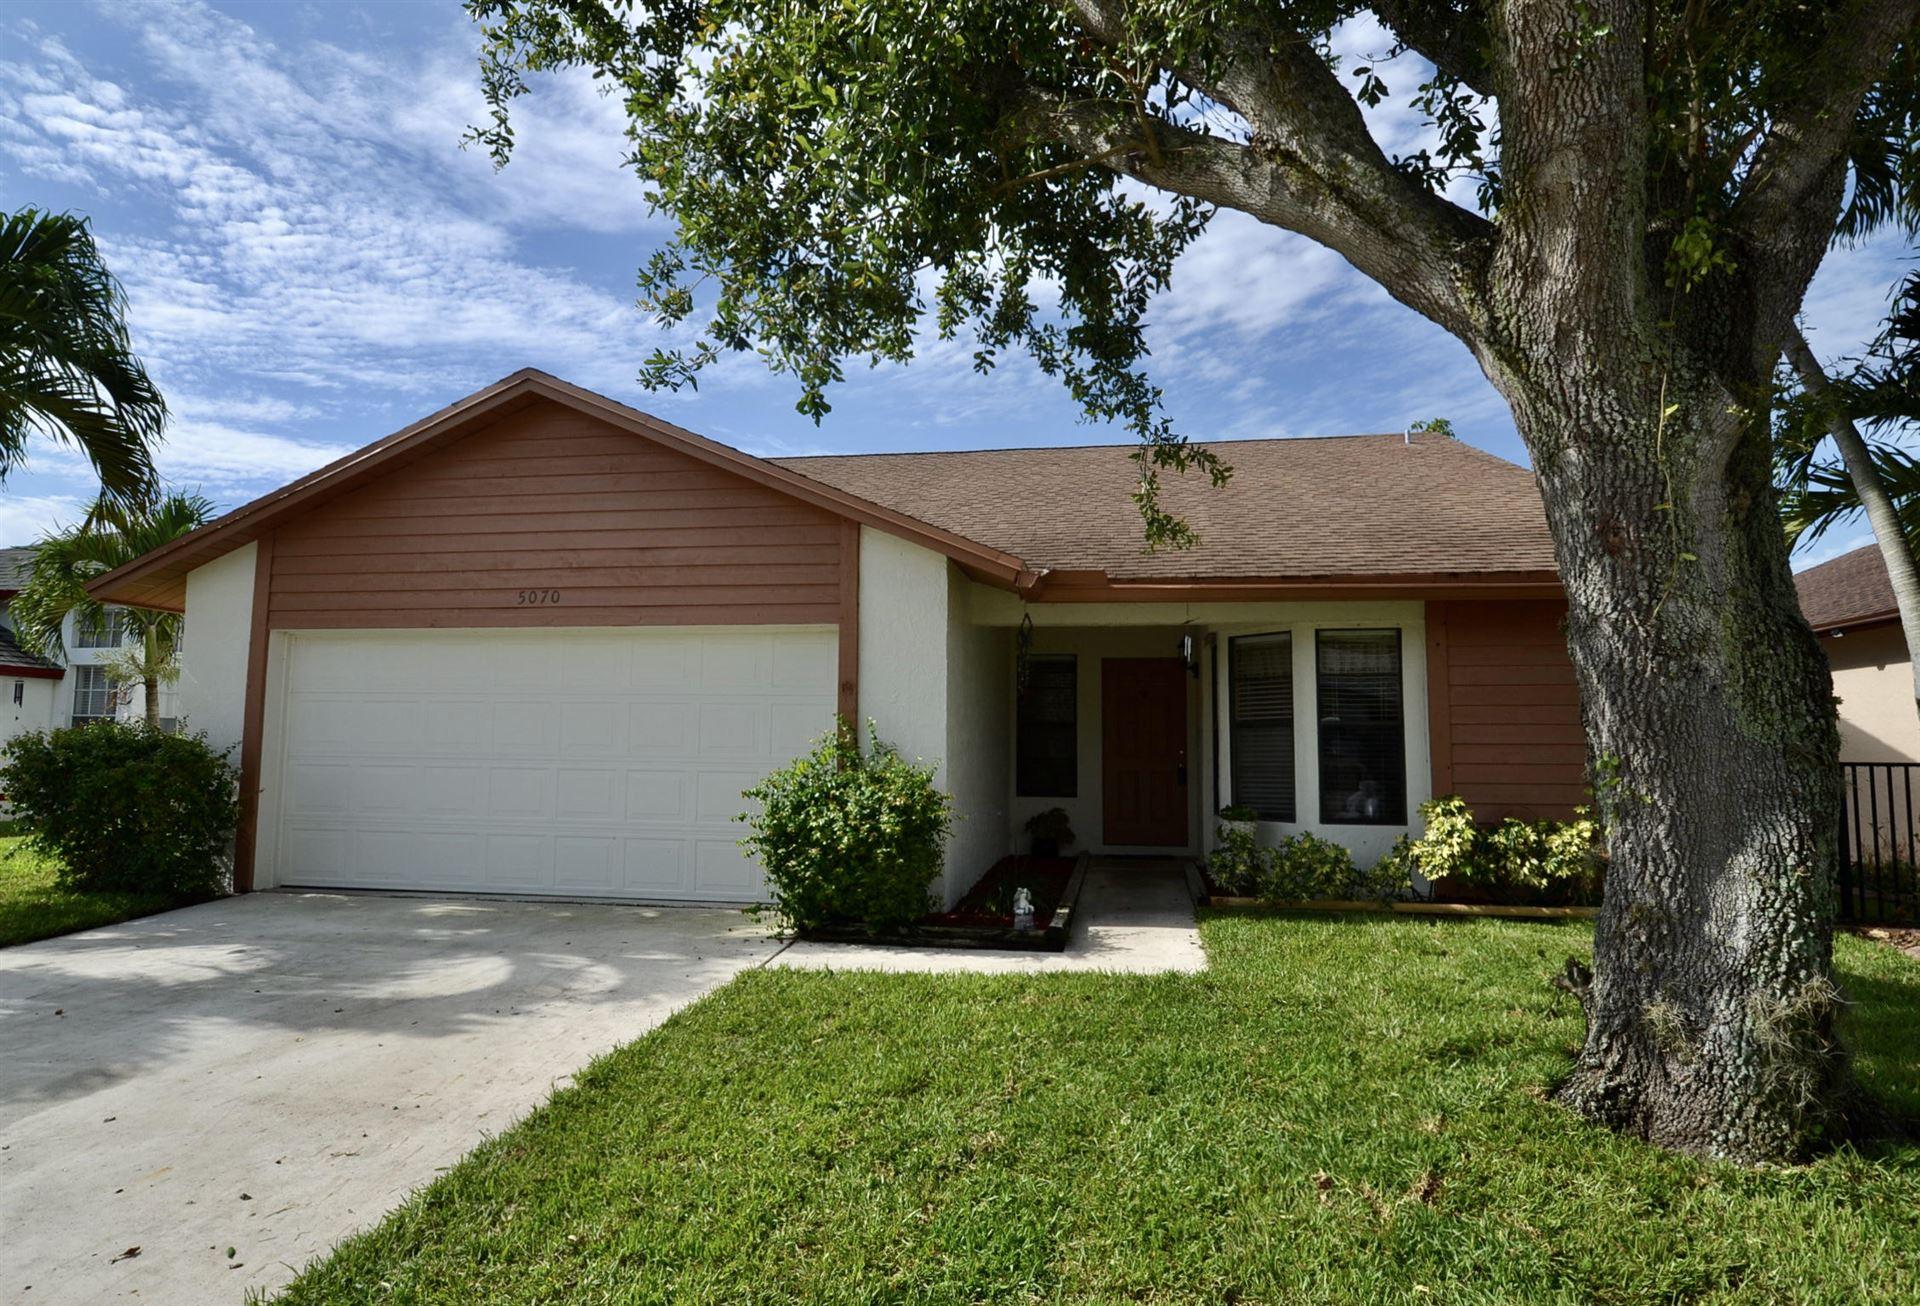 5070 Foxhall Drive N, West Palm Beach, FL 33417 - #: RX-10715435